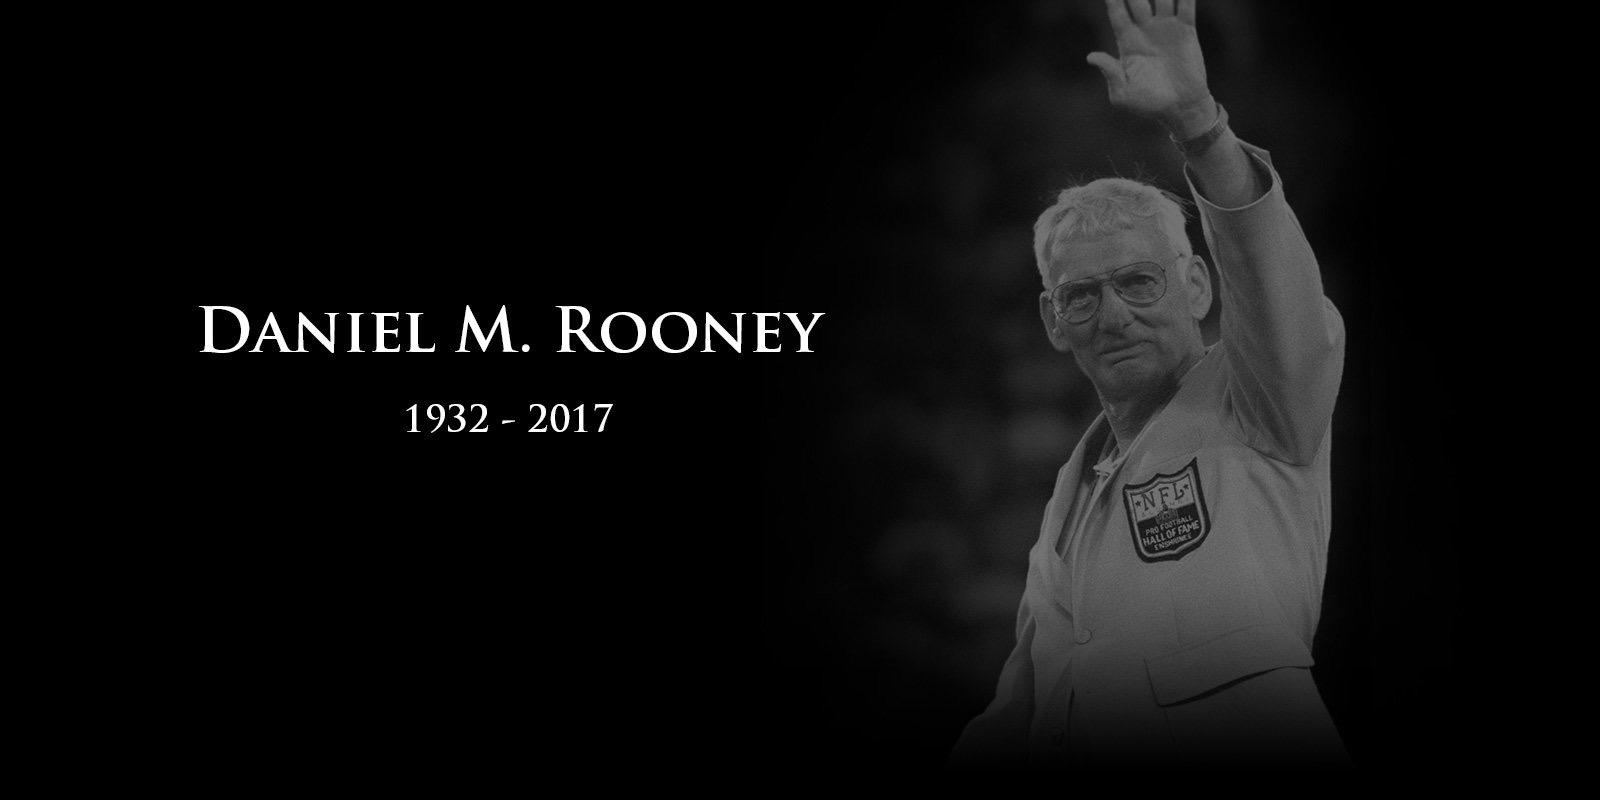 Steelers Longtime Owner Dan Rooney Passes Away